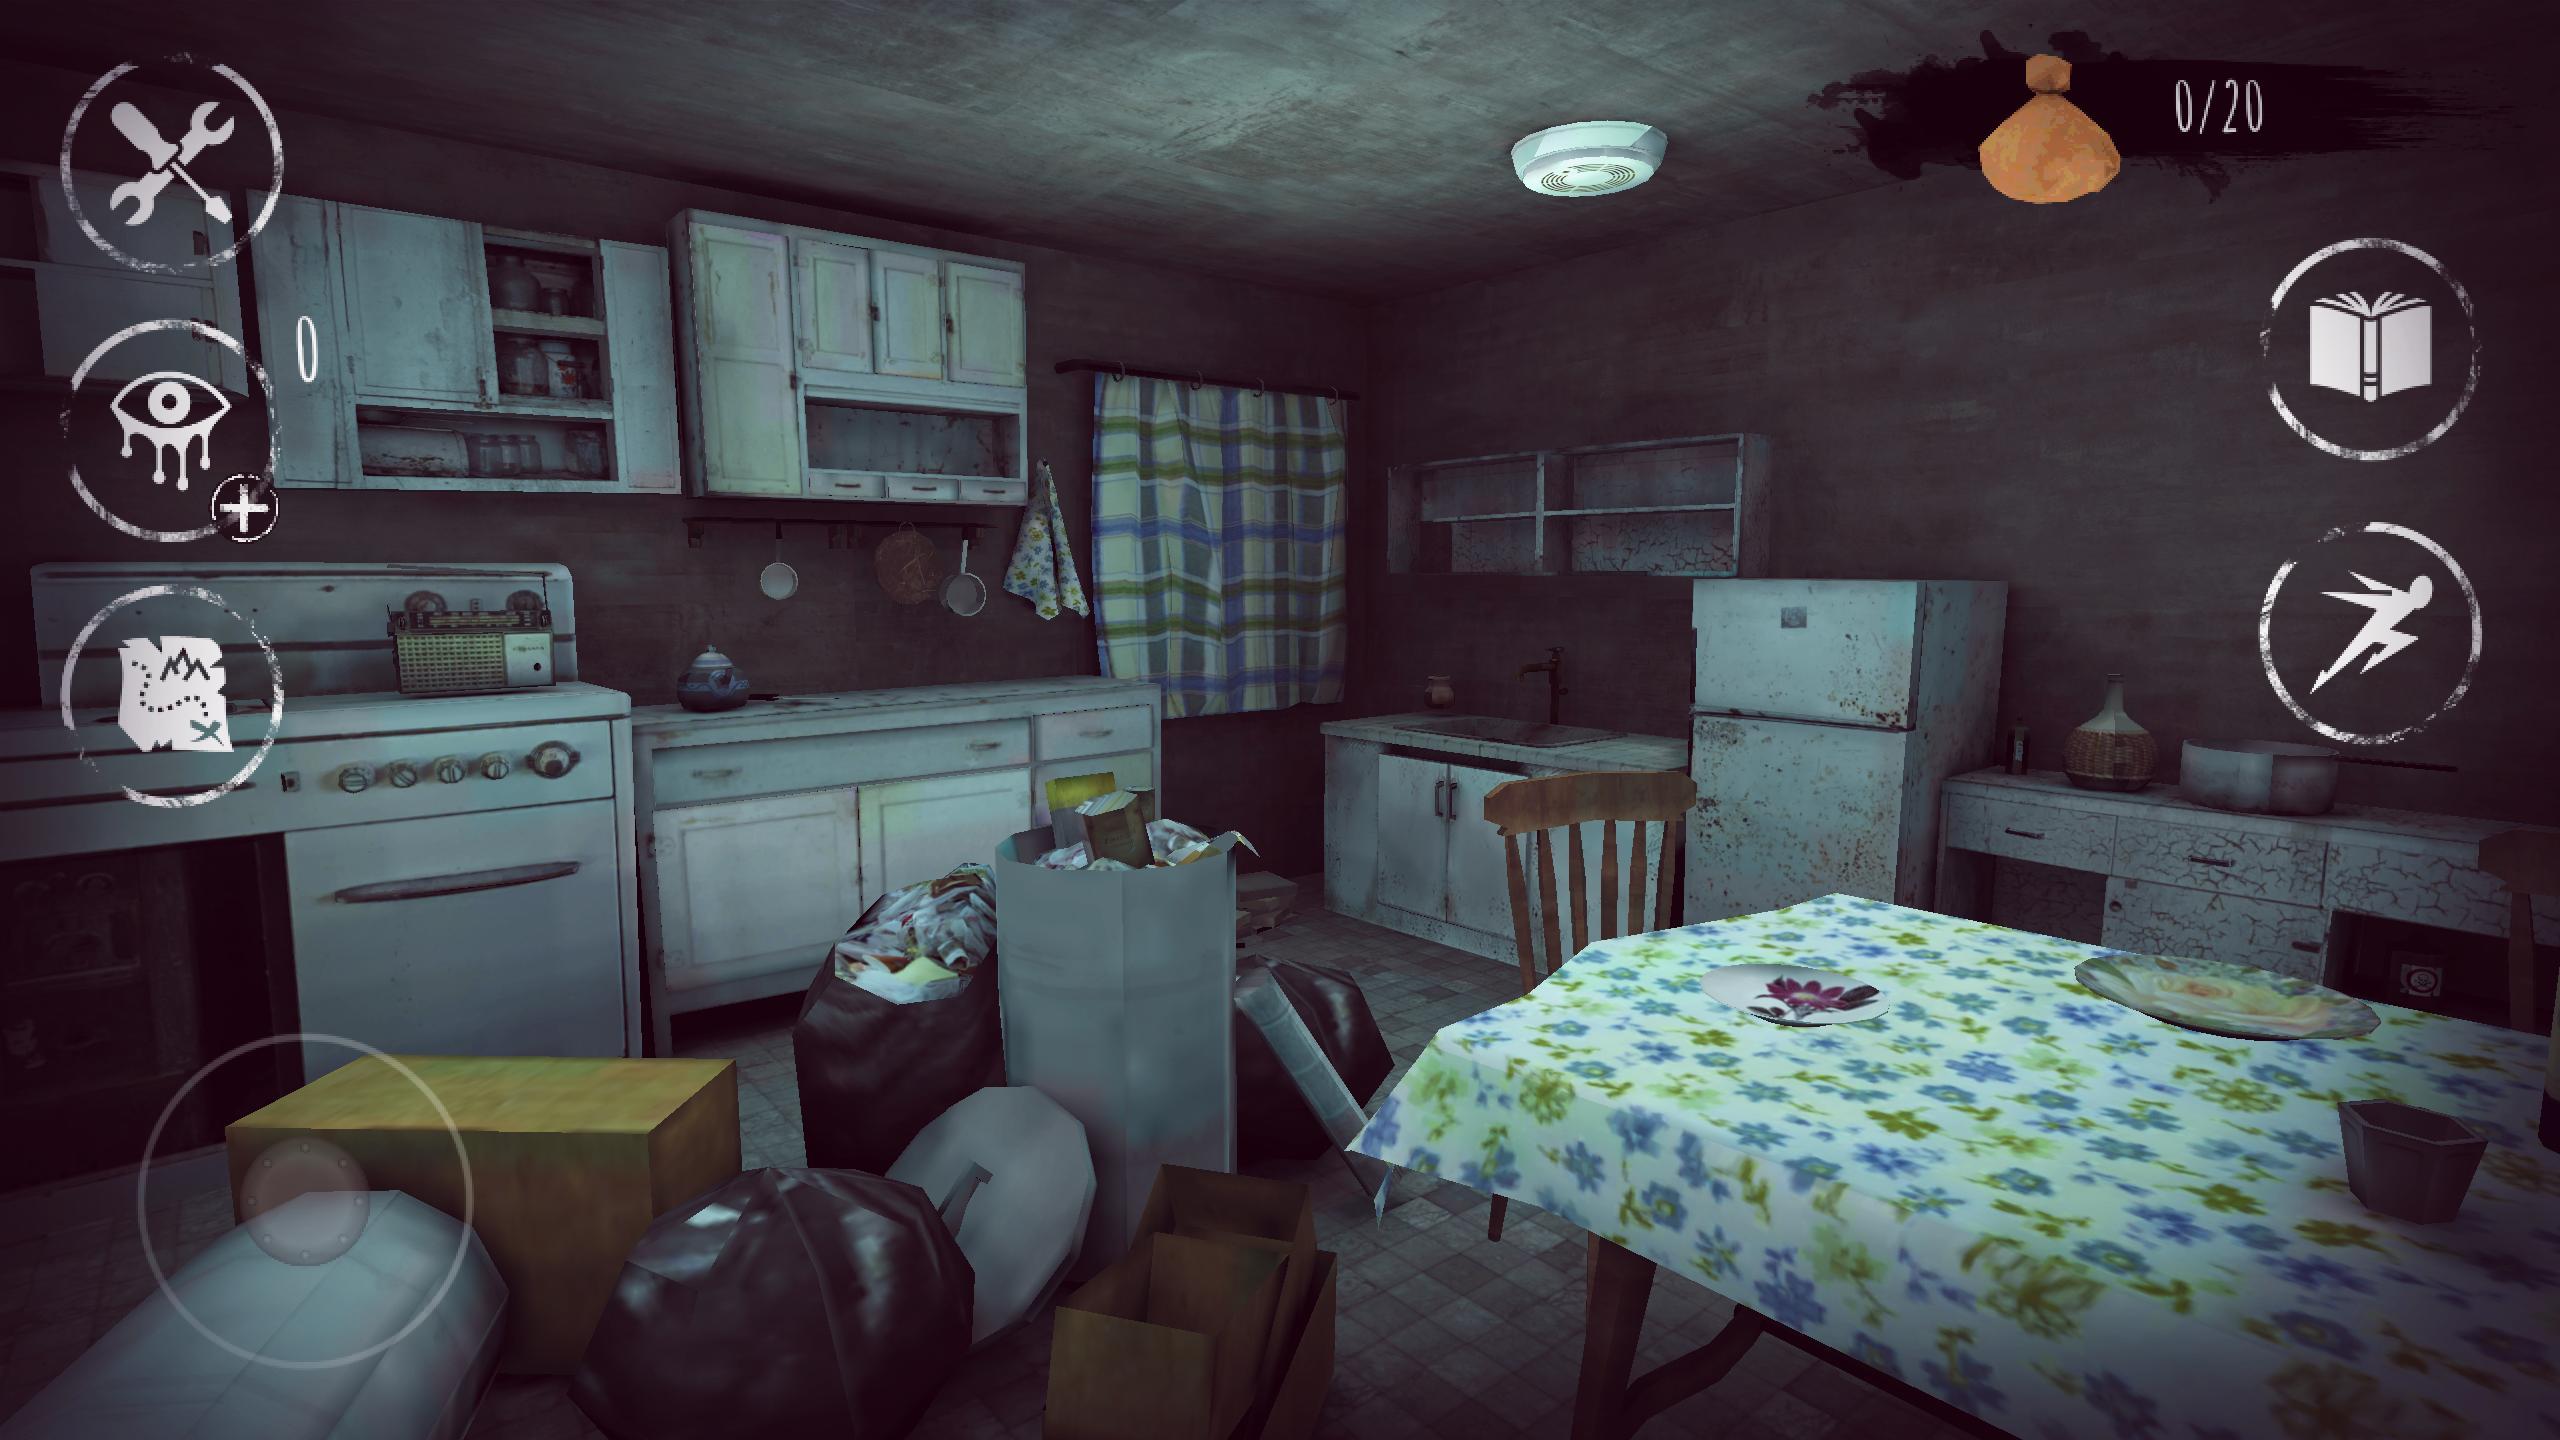 Eyes: Scary Thriller - Creepy Horror Game 6.1.1 Screenshot 3